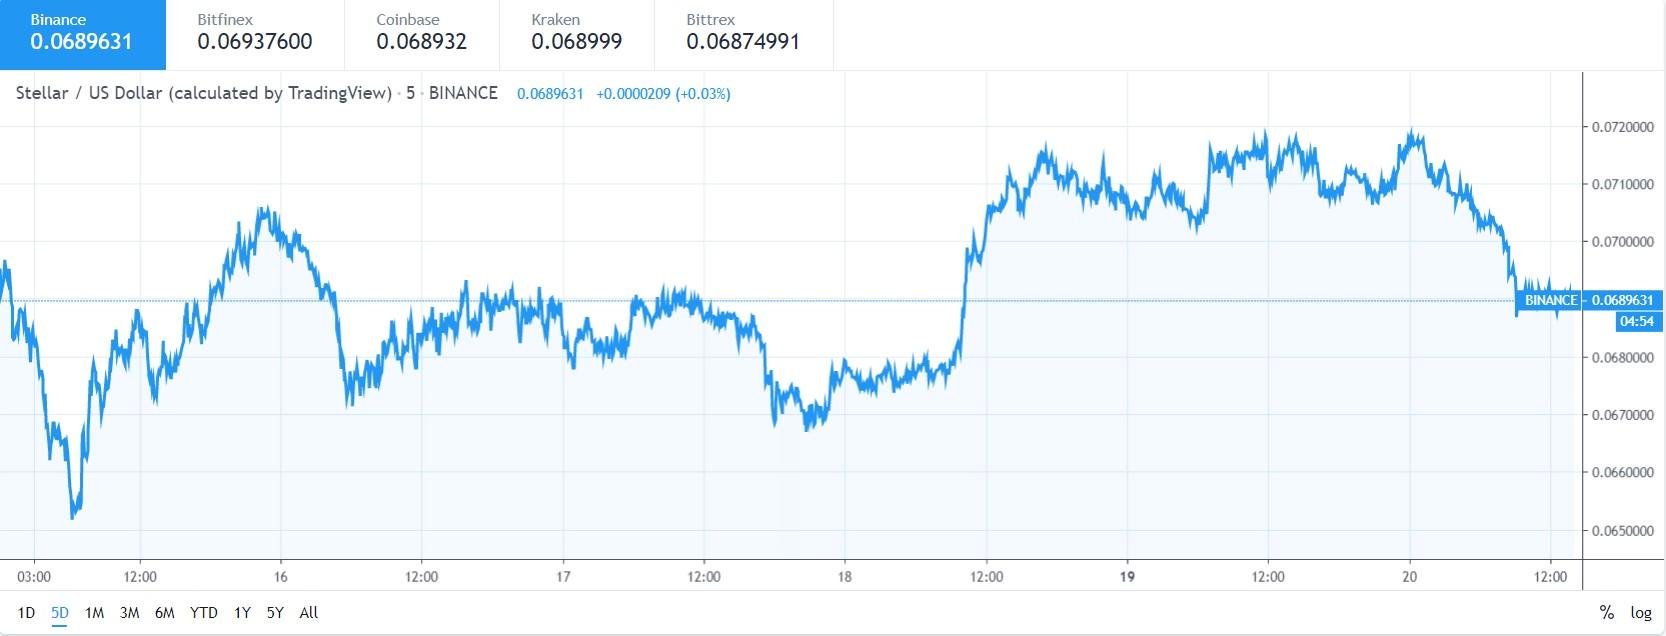 Stellar XLM price analysis: Yet another bearish trend?